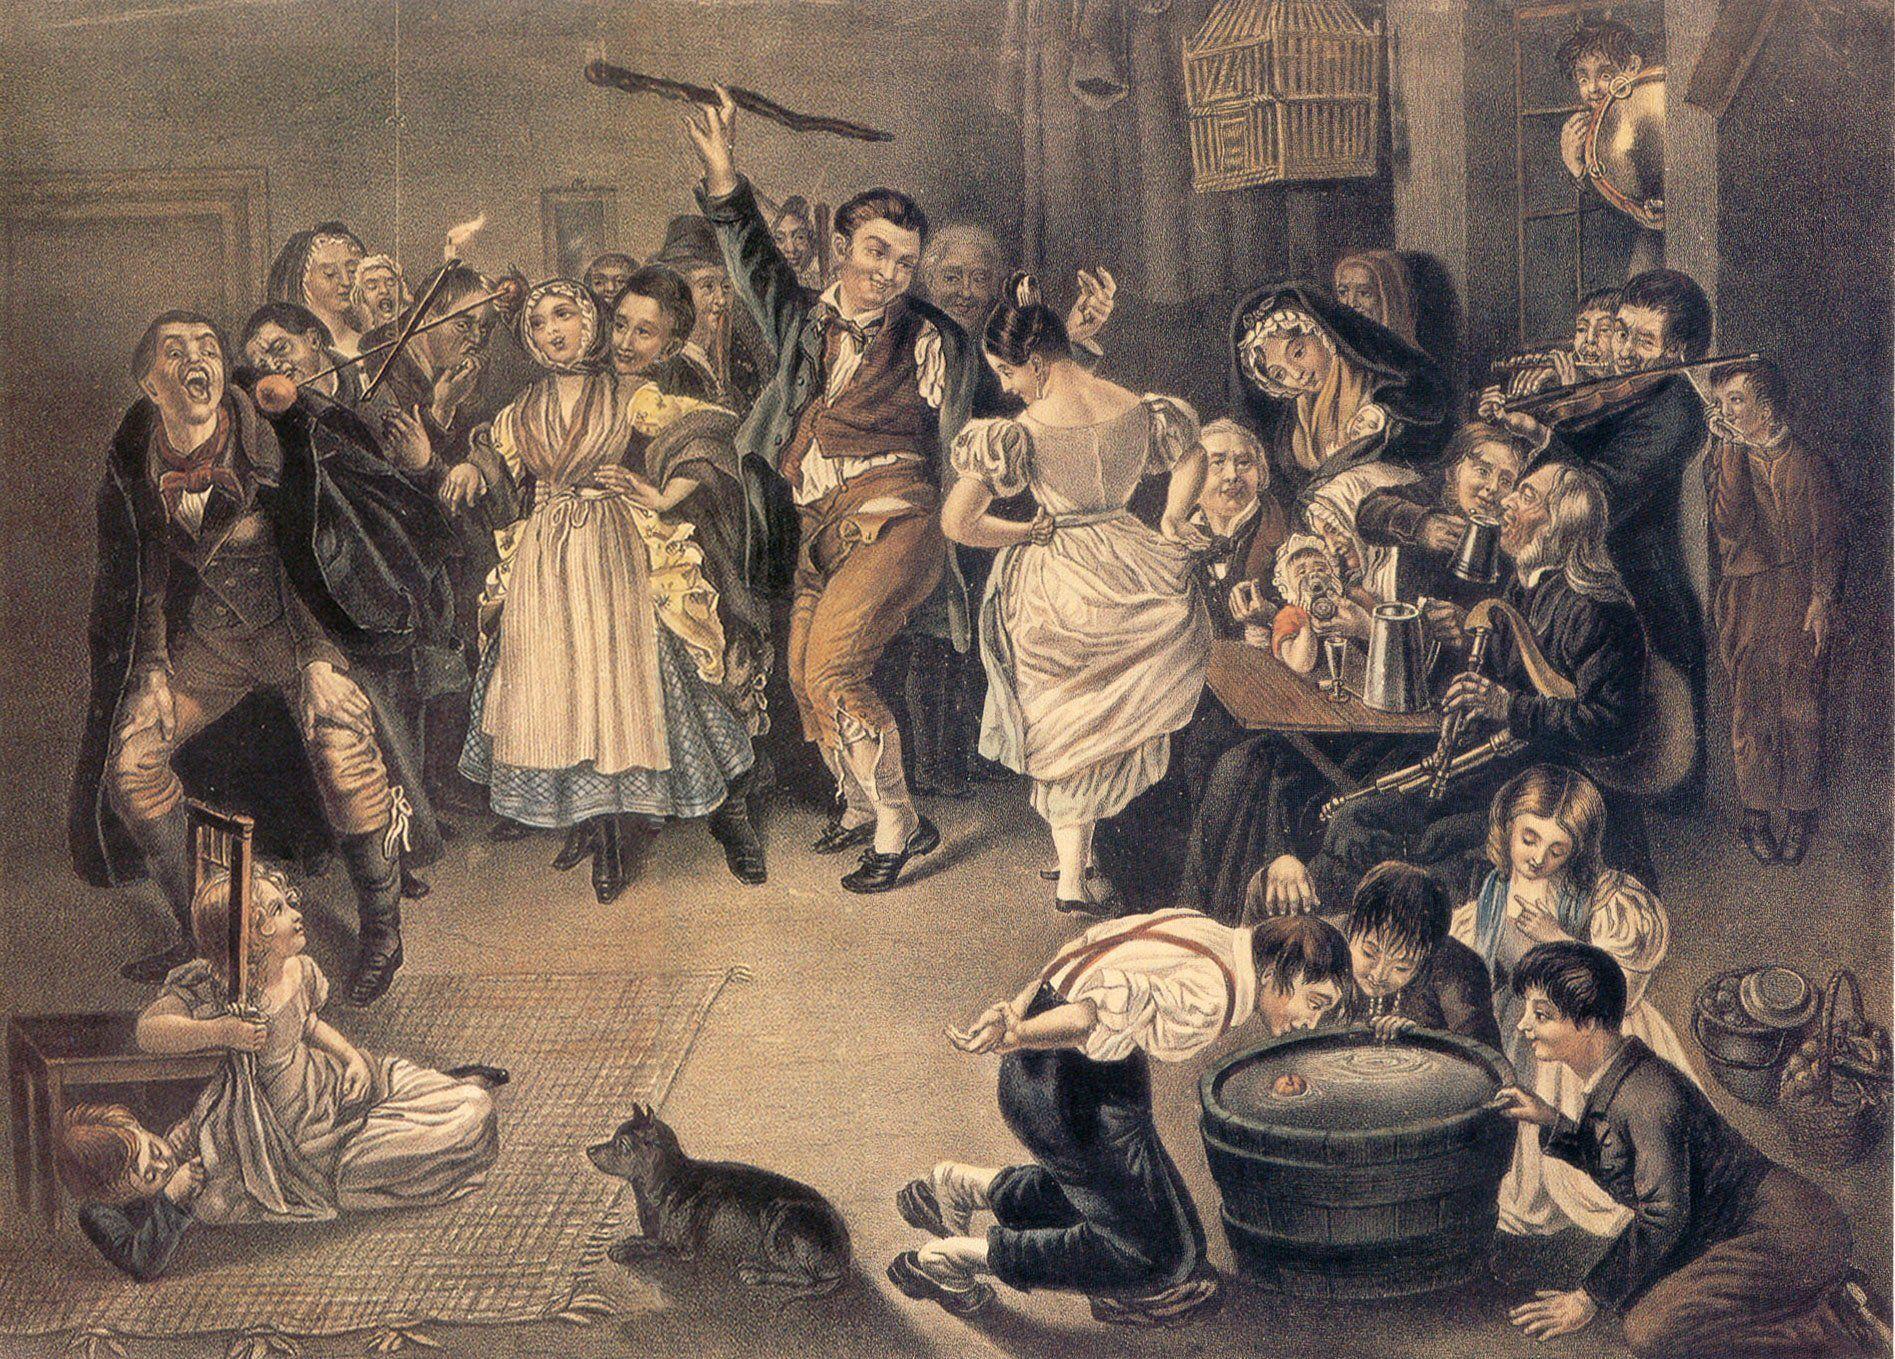 Daniel Maclise - Snap-Apple Night - 1833